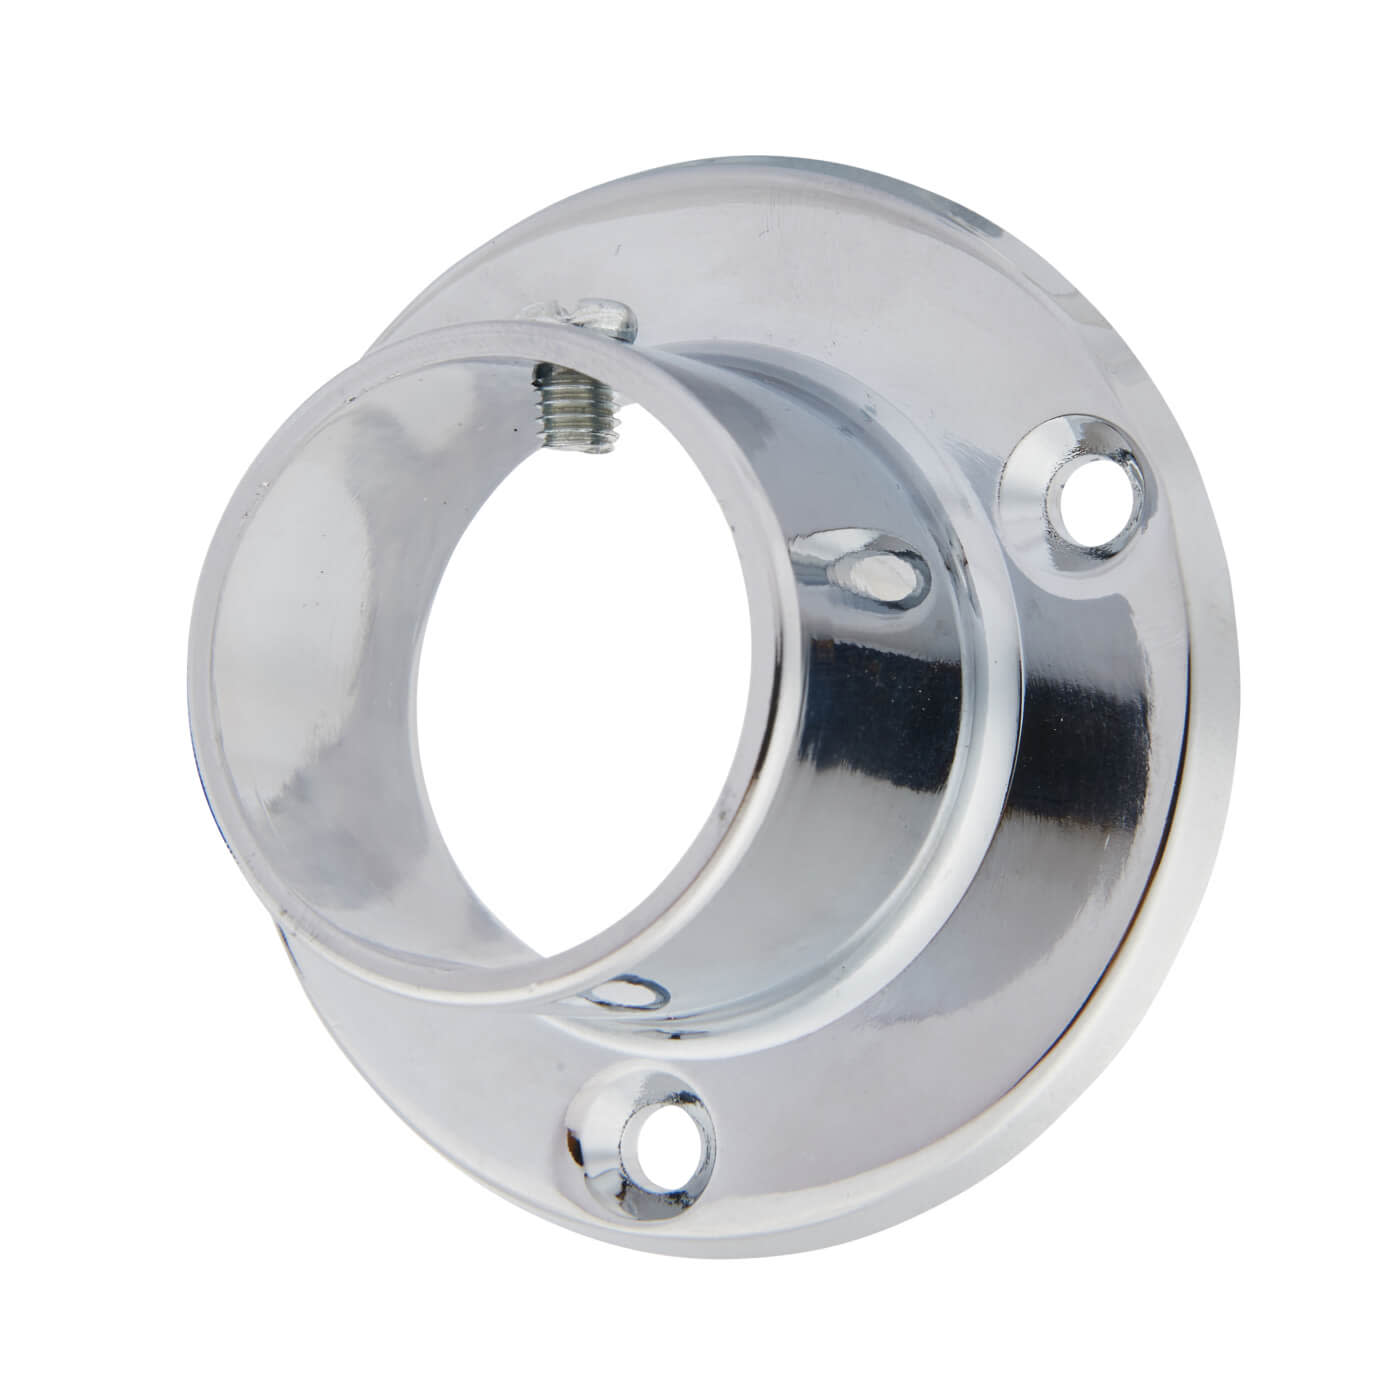 Tube End Socket Pack With Locking Grub Screws - 32mm - Chrome - Pack 2)